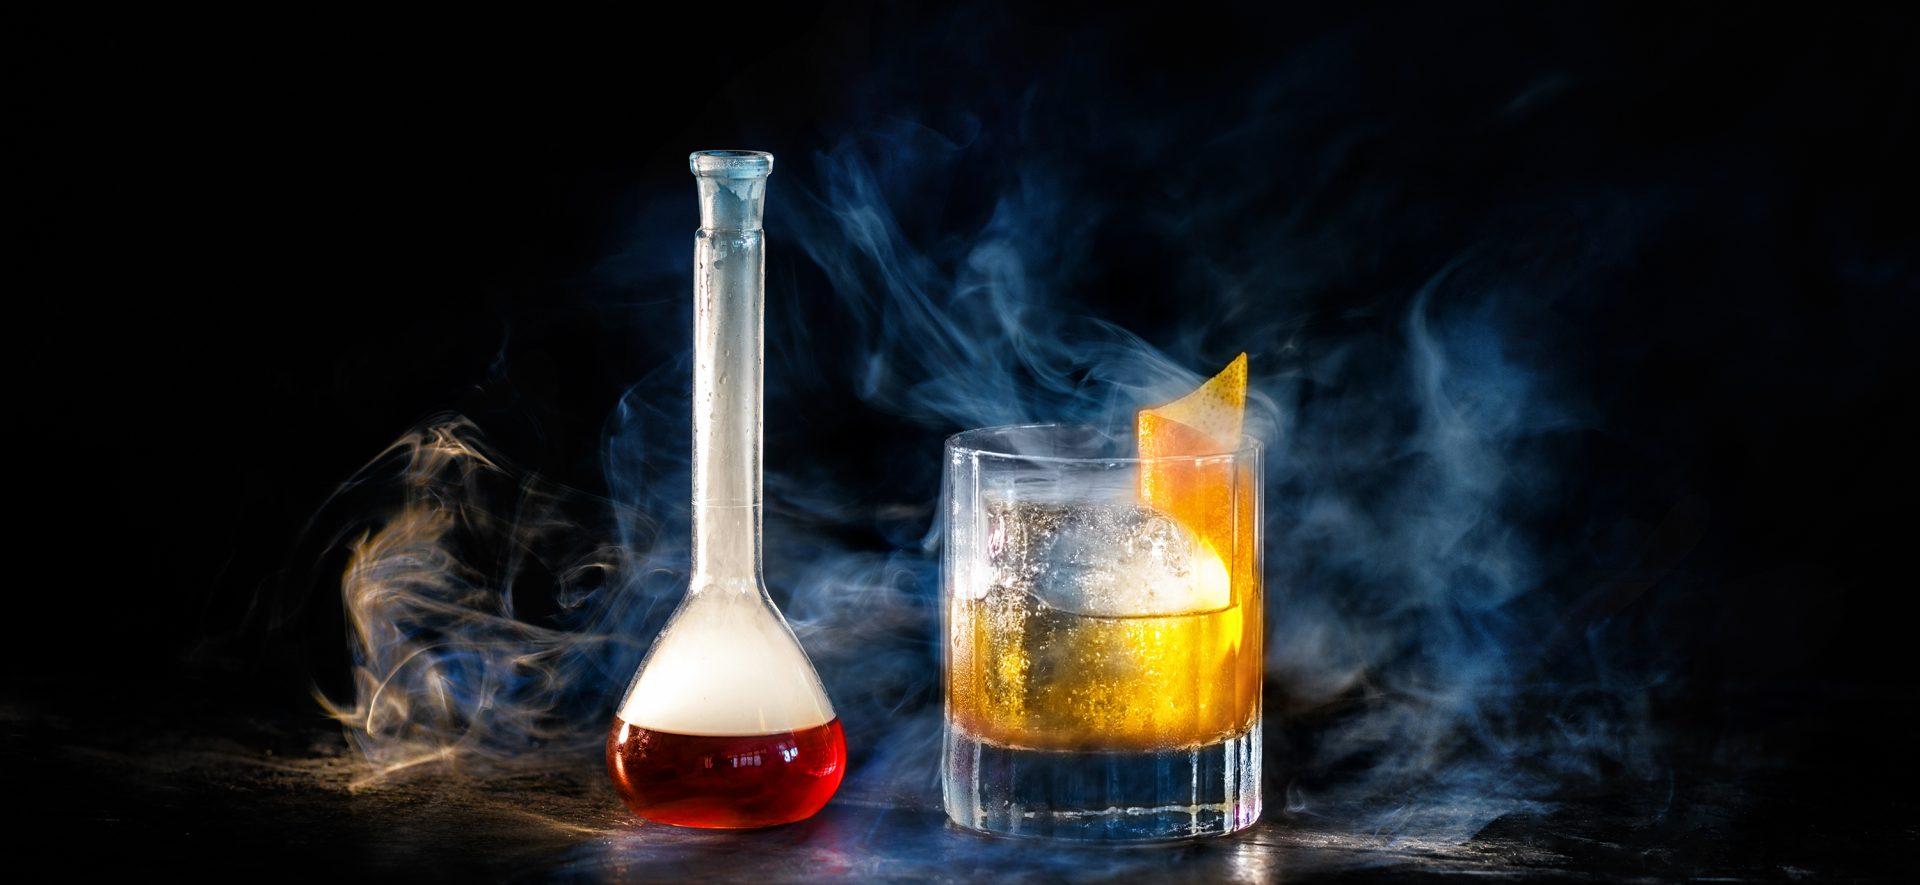 Cocktails at Novikov Miami bar in South Florida